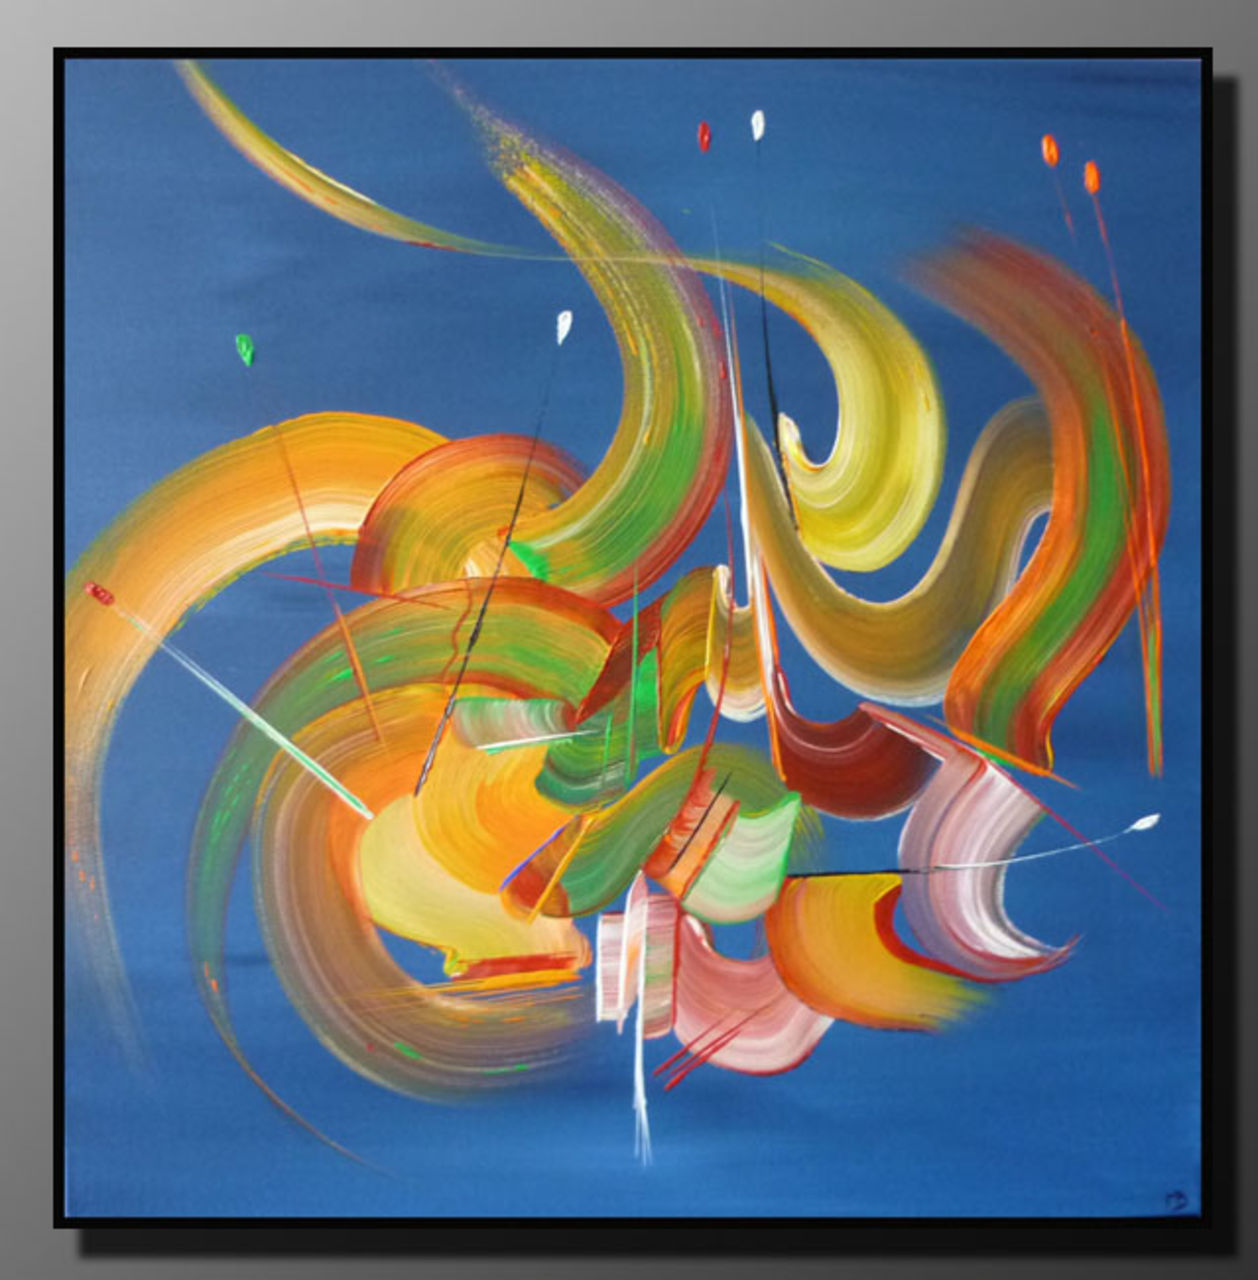 Martine BELFODIL Artiste Peintre professionnelle Peinture abstraite Les rubans